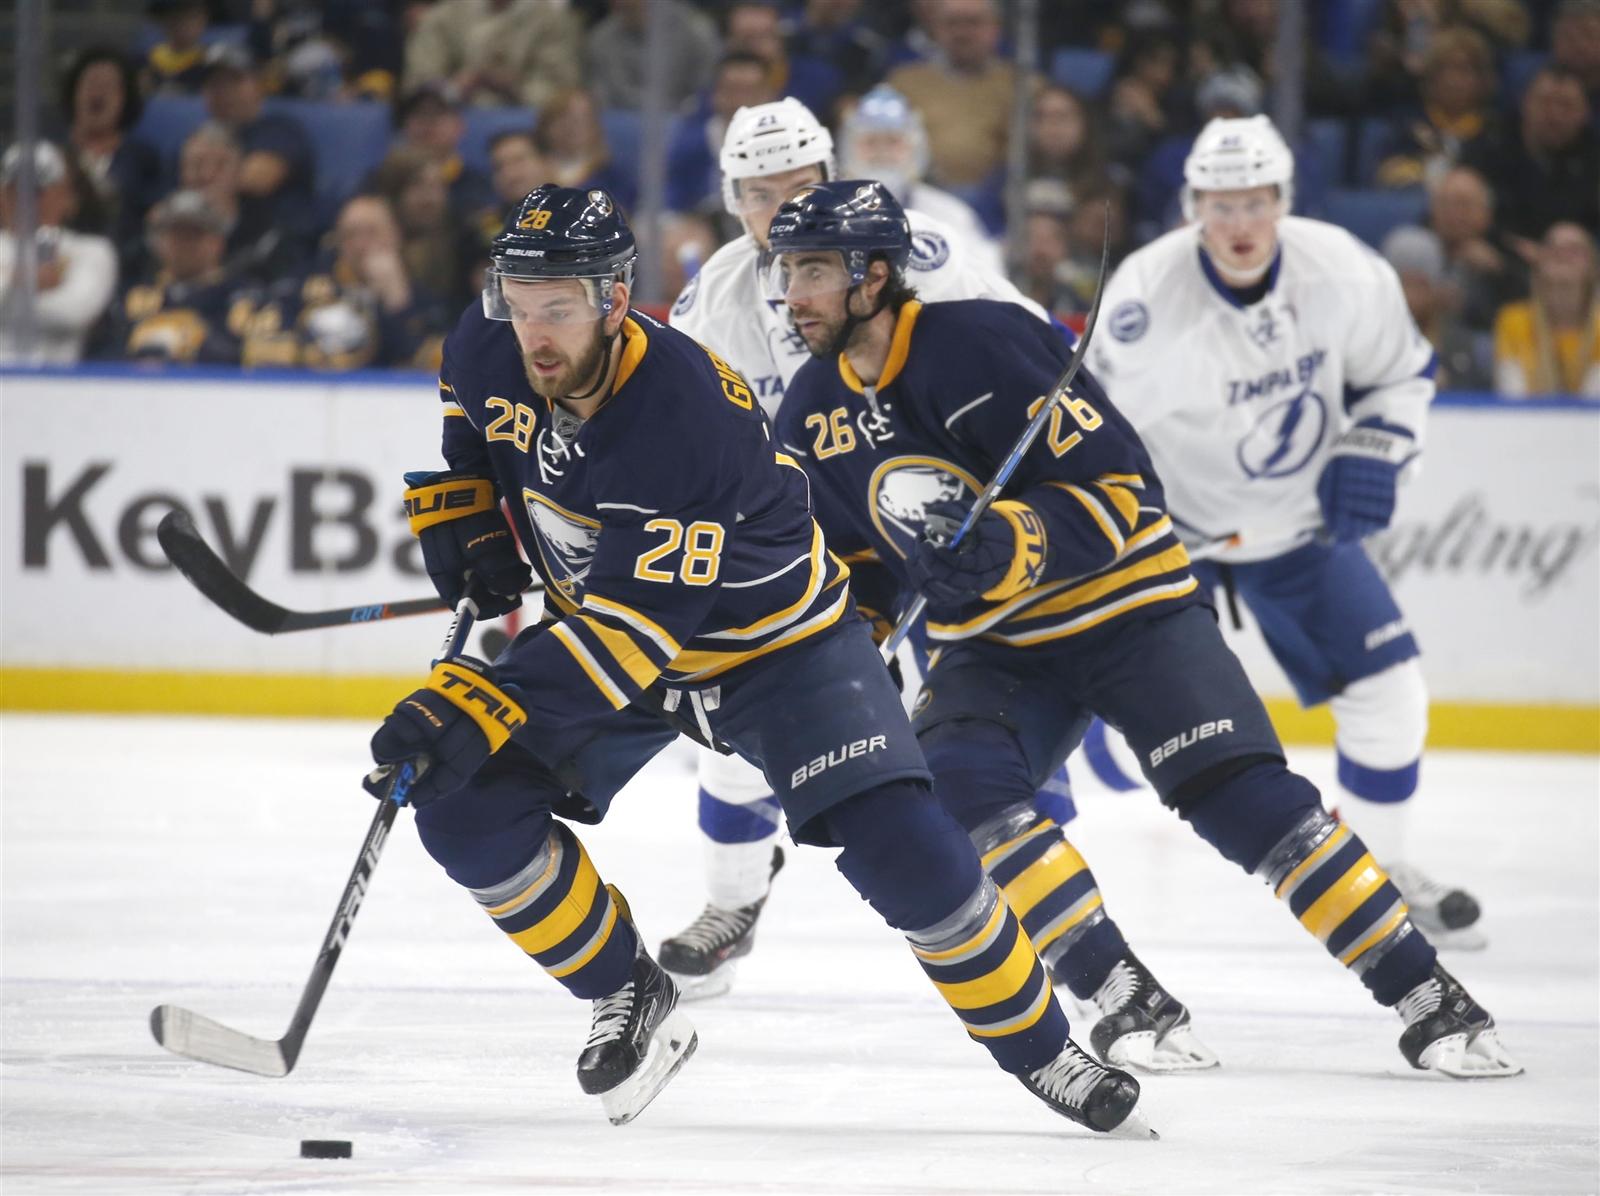 Zemgus Girgensons (28), Matt Moulson and the Sabres have major second-period woes. (Robert Kirkham/Buffalo News)